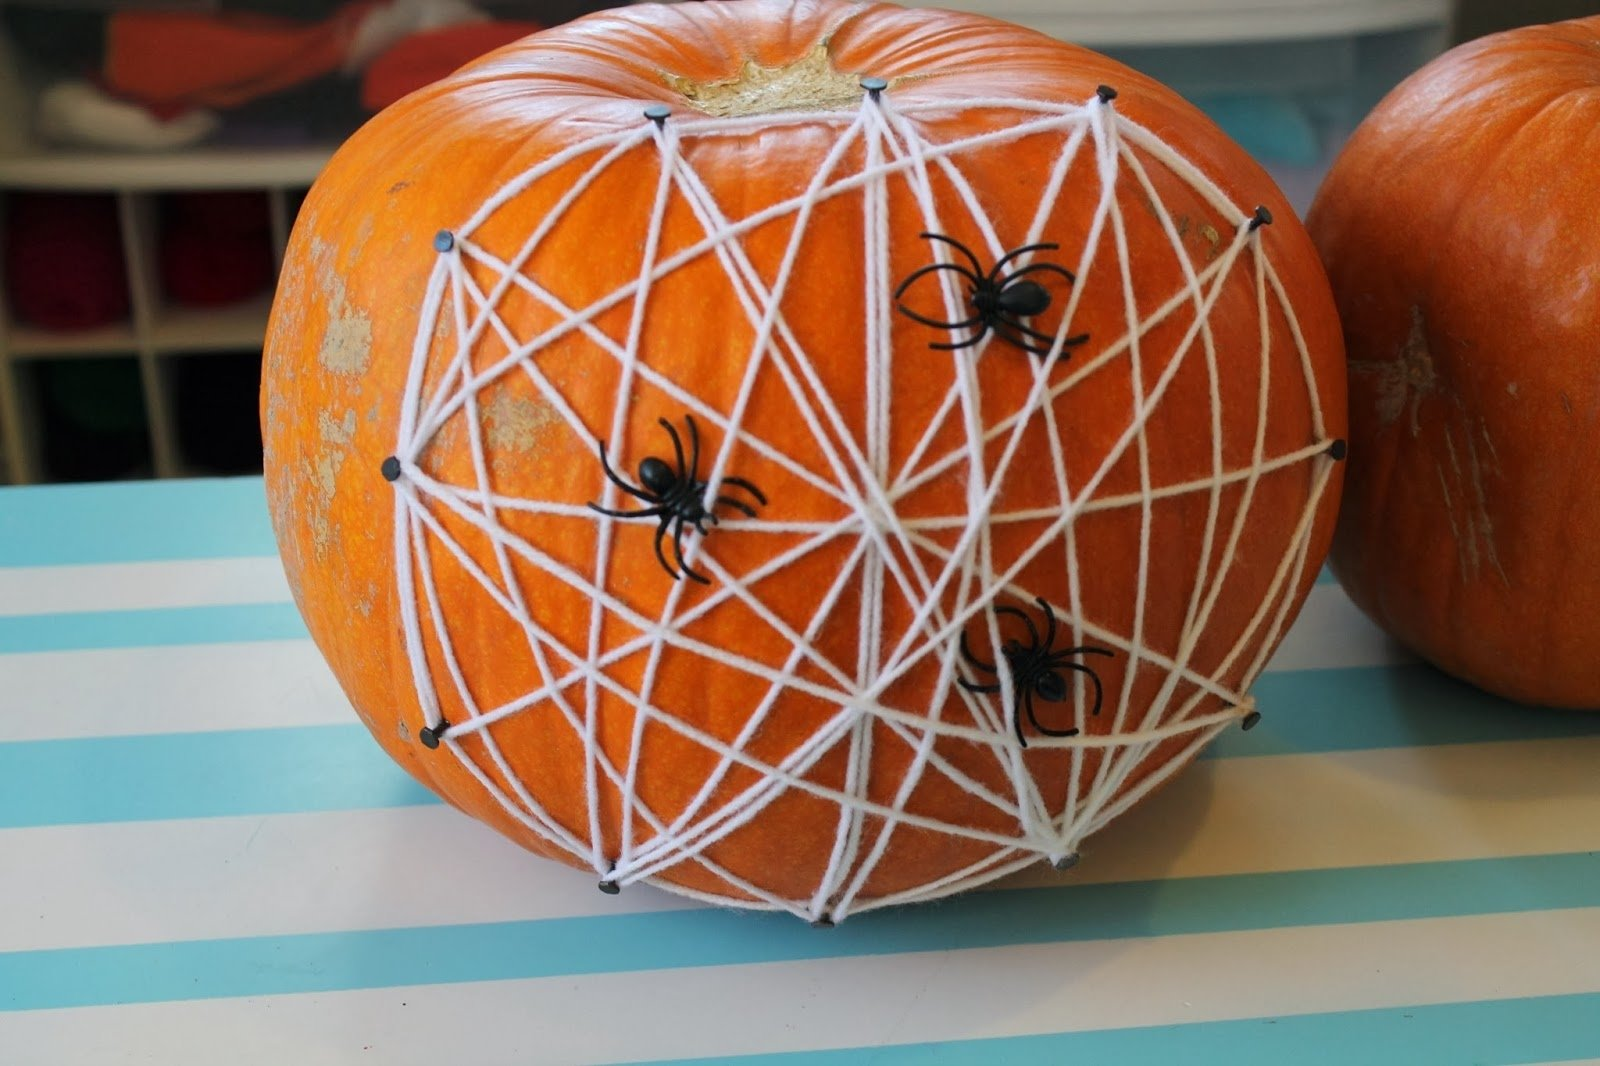 10 Beautiful Pumpkin Decorating Ideas No Carve no carve pumpkin ideas find it make it love it 1 2020